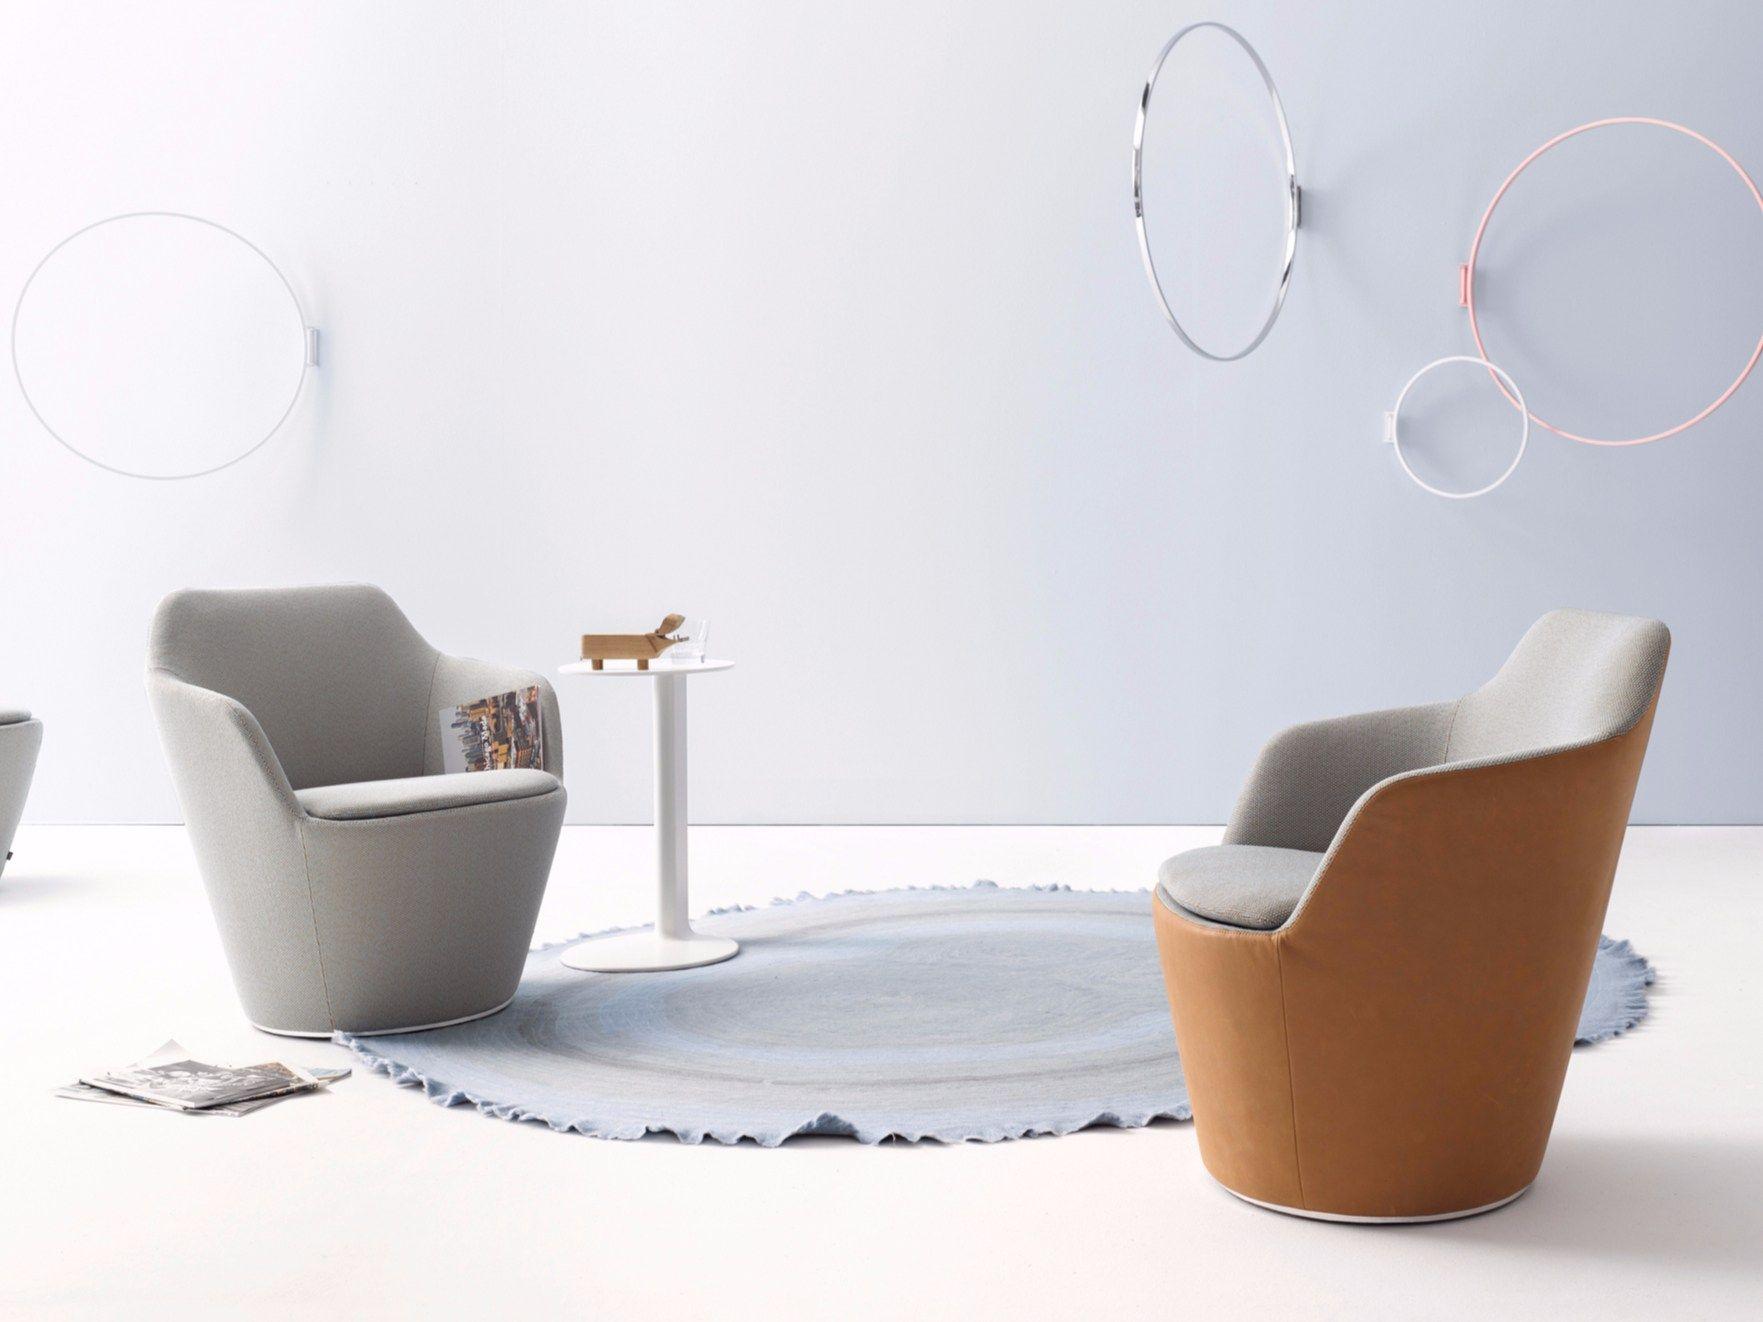 loungesessel mit armlehnen flint by cor sitzm bel helmut l bke design jehs laub. Black Bedroom Furniture Sets. Home Design Ideas